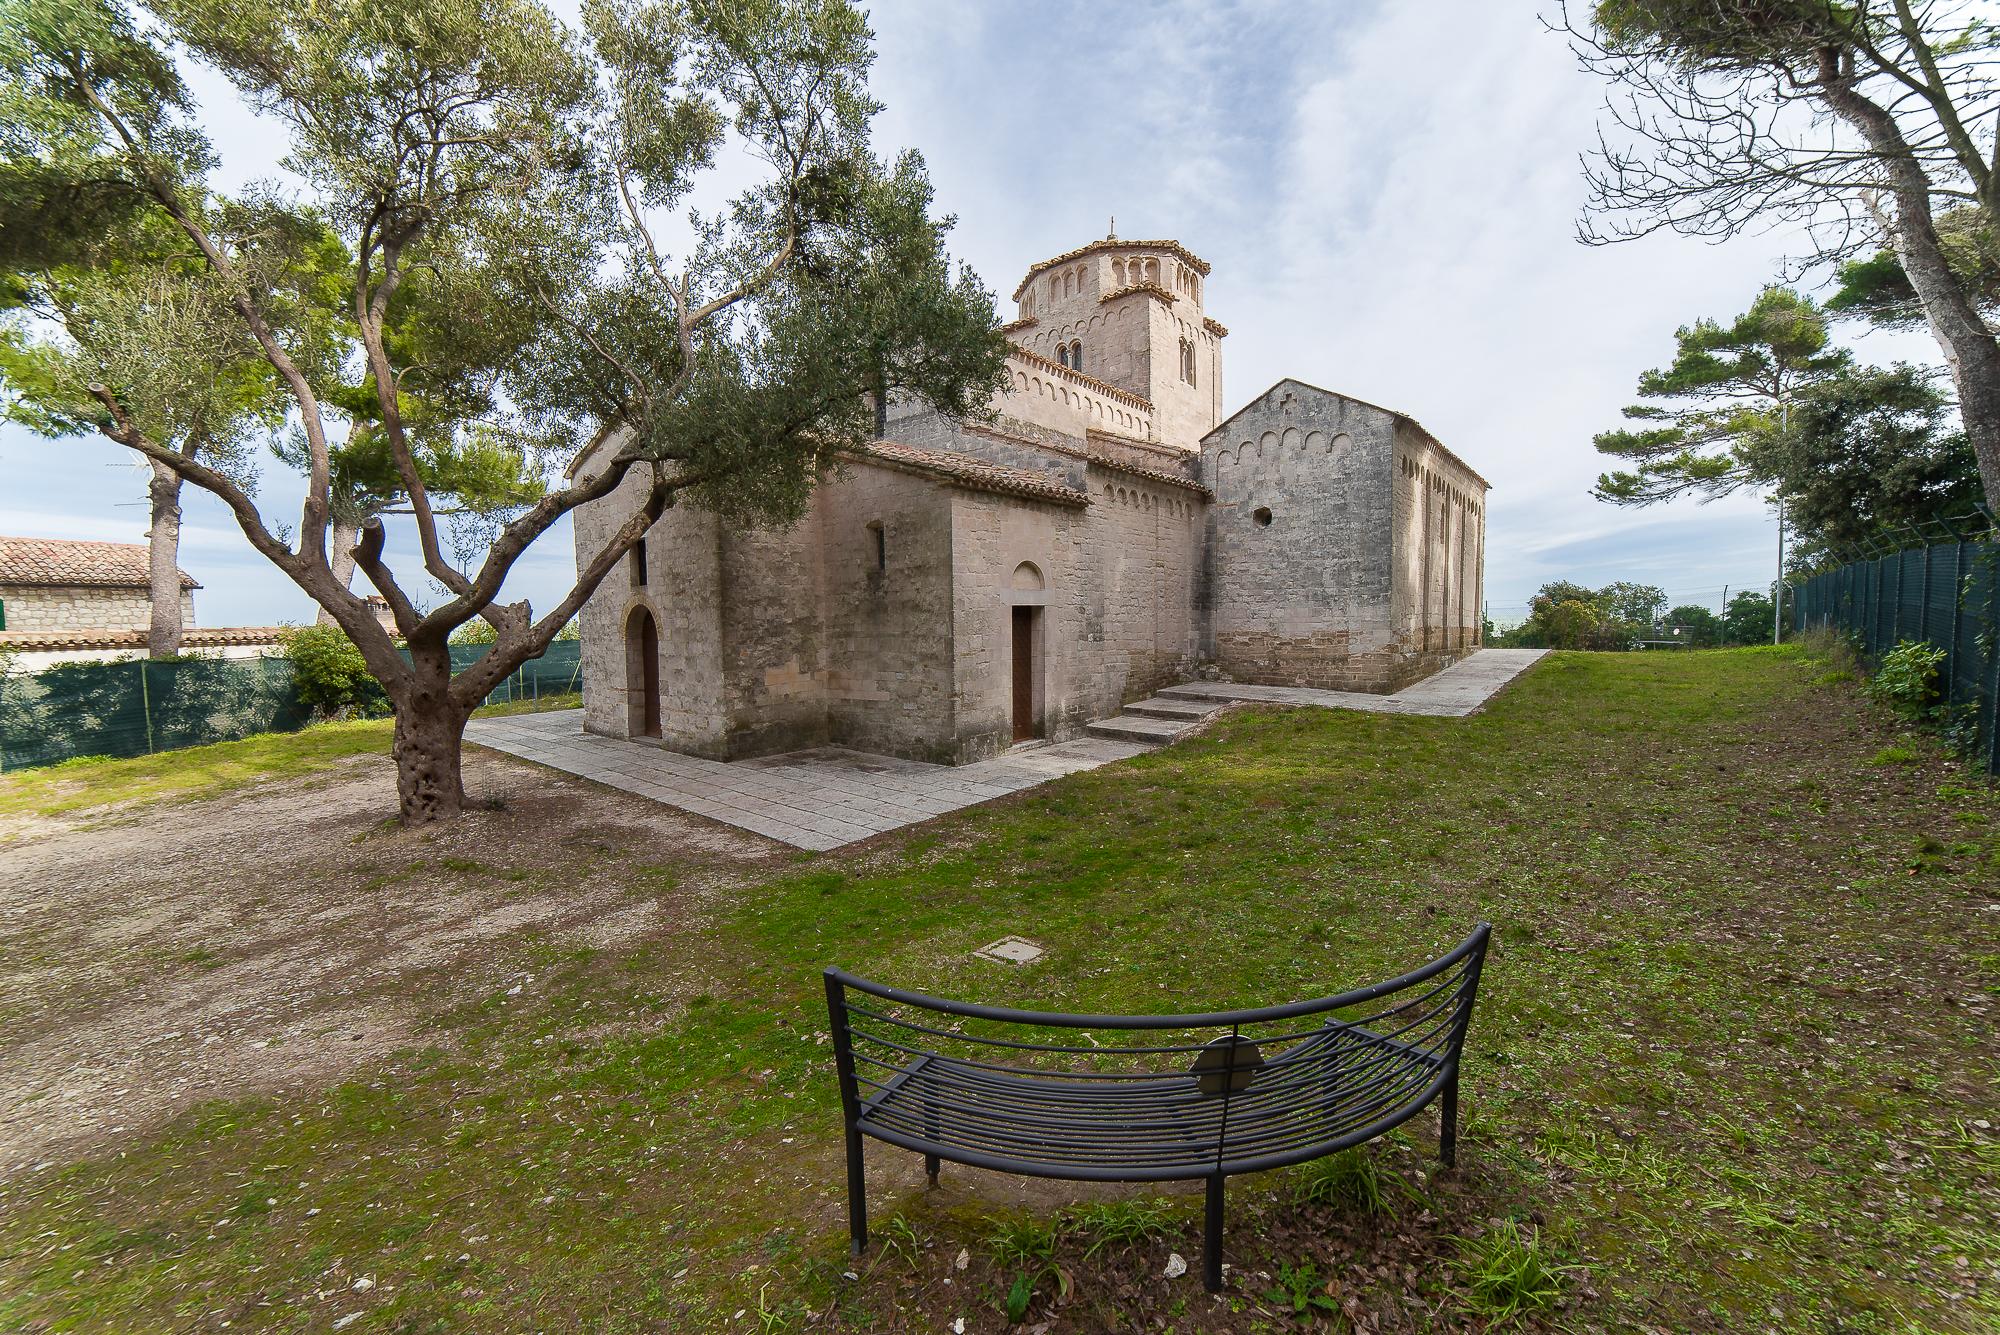 Panchina con vista su Chiesa di Santa Maria Portonovo...